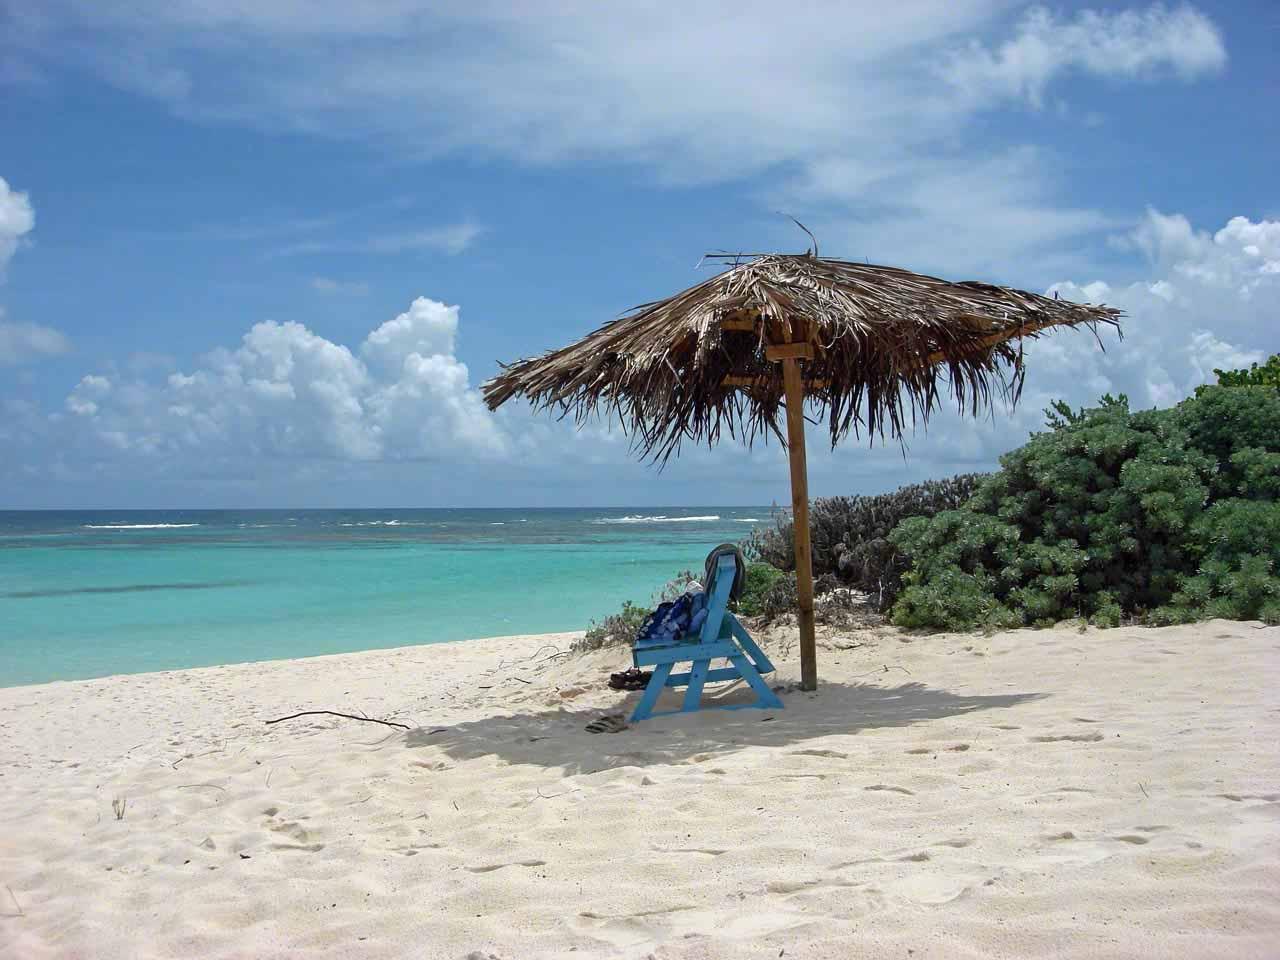 Loblolly Beach, Anegada